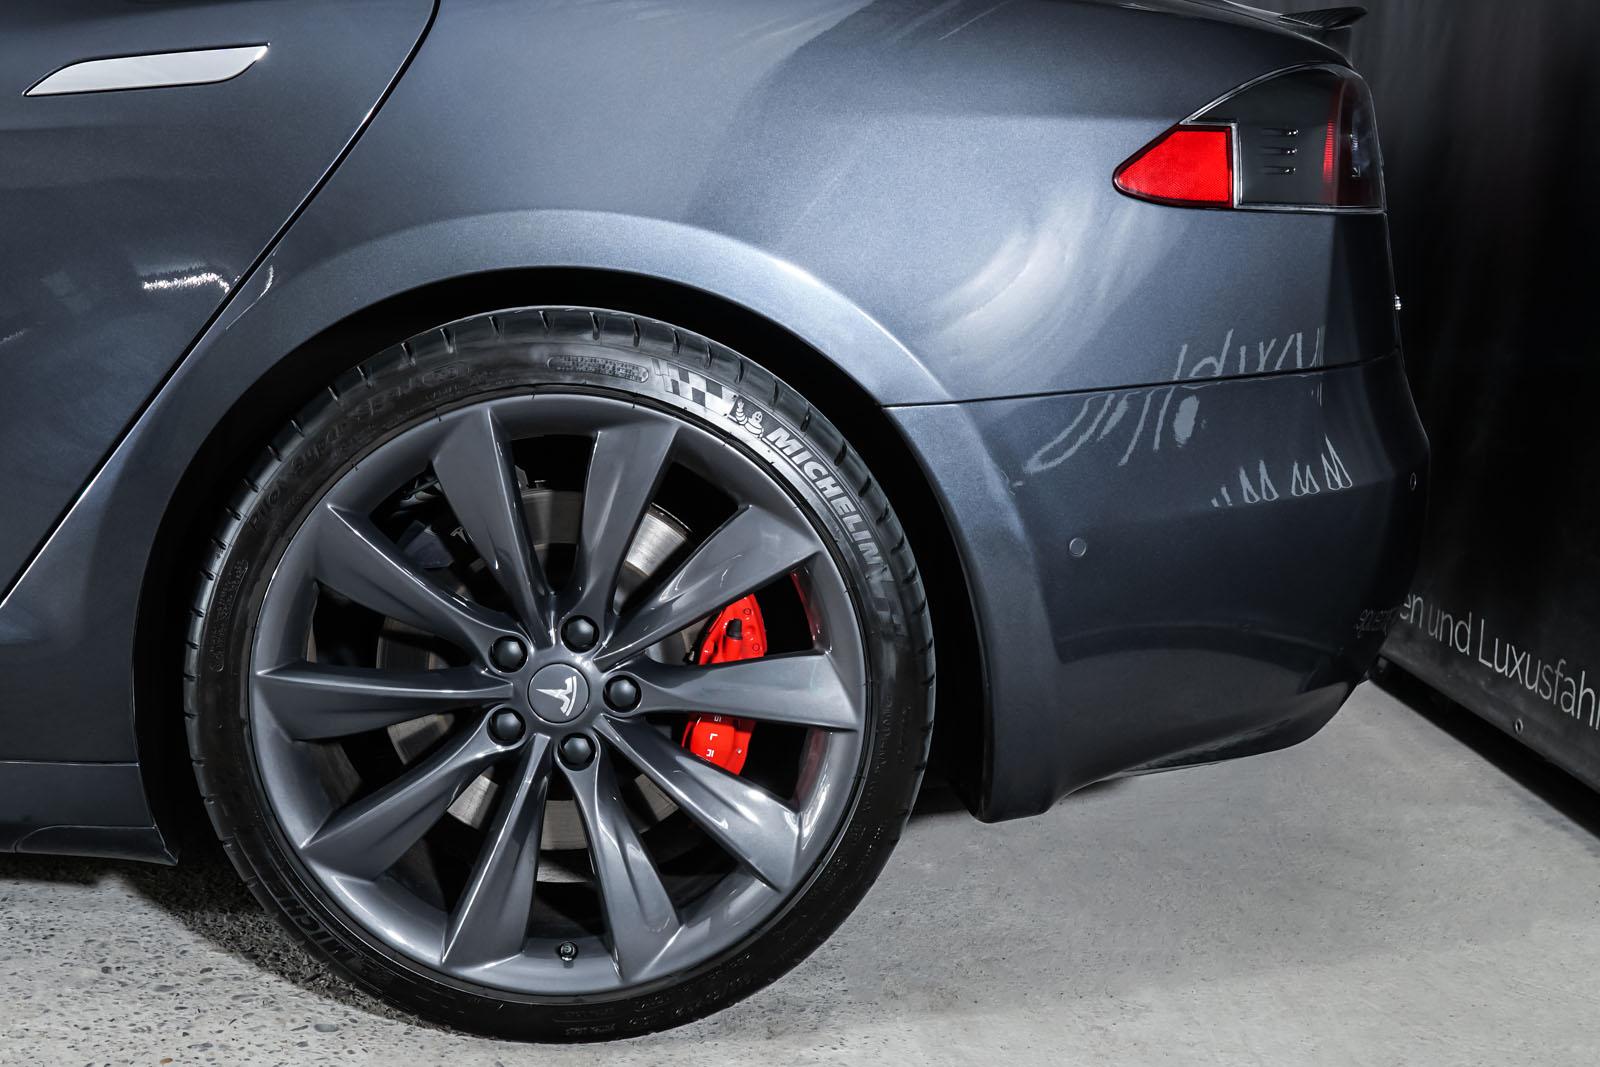 Tesla_ModelS_P100D_MidnightSilver_Black_TES-6539_4_w